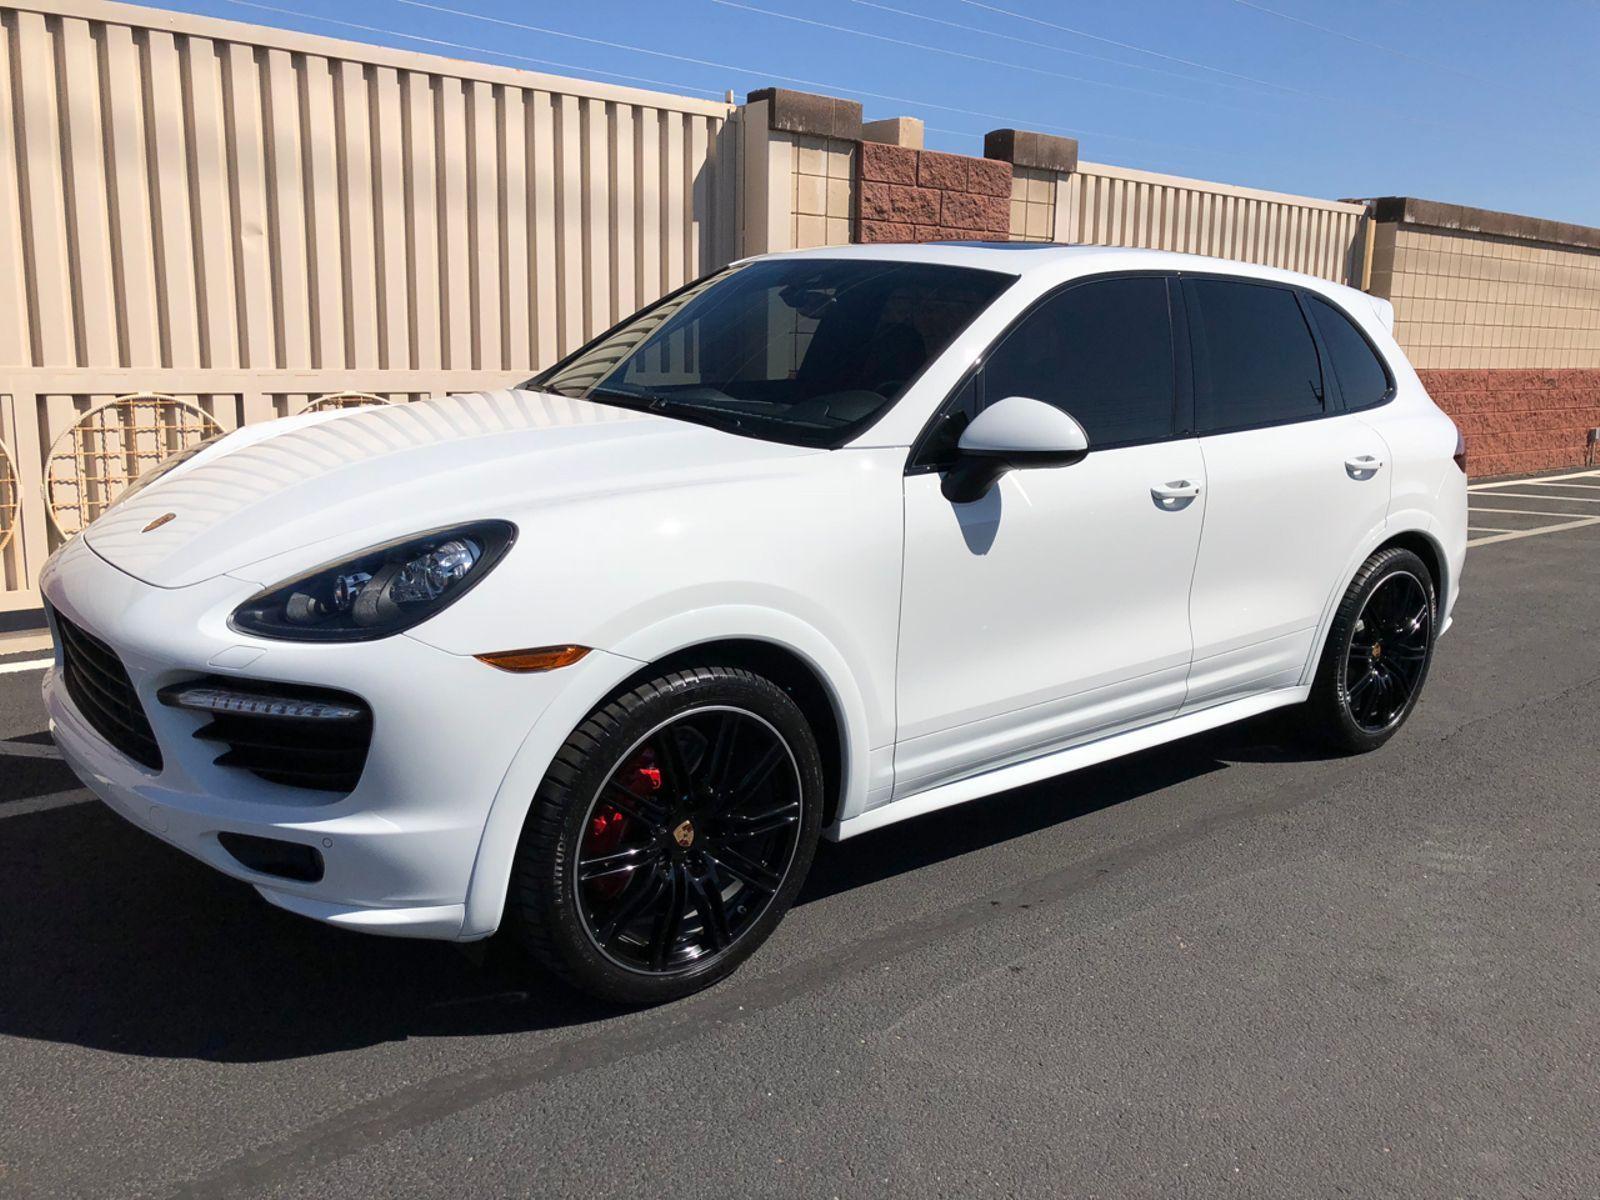 2014 Porsche Cayenne Gts Cayenne Gts 2013 2014 2015 2016 2017 White Carmine Red Black One Owner 2017 2018 24carshop Com